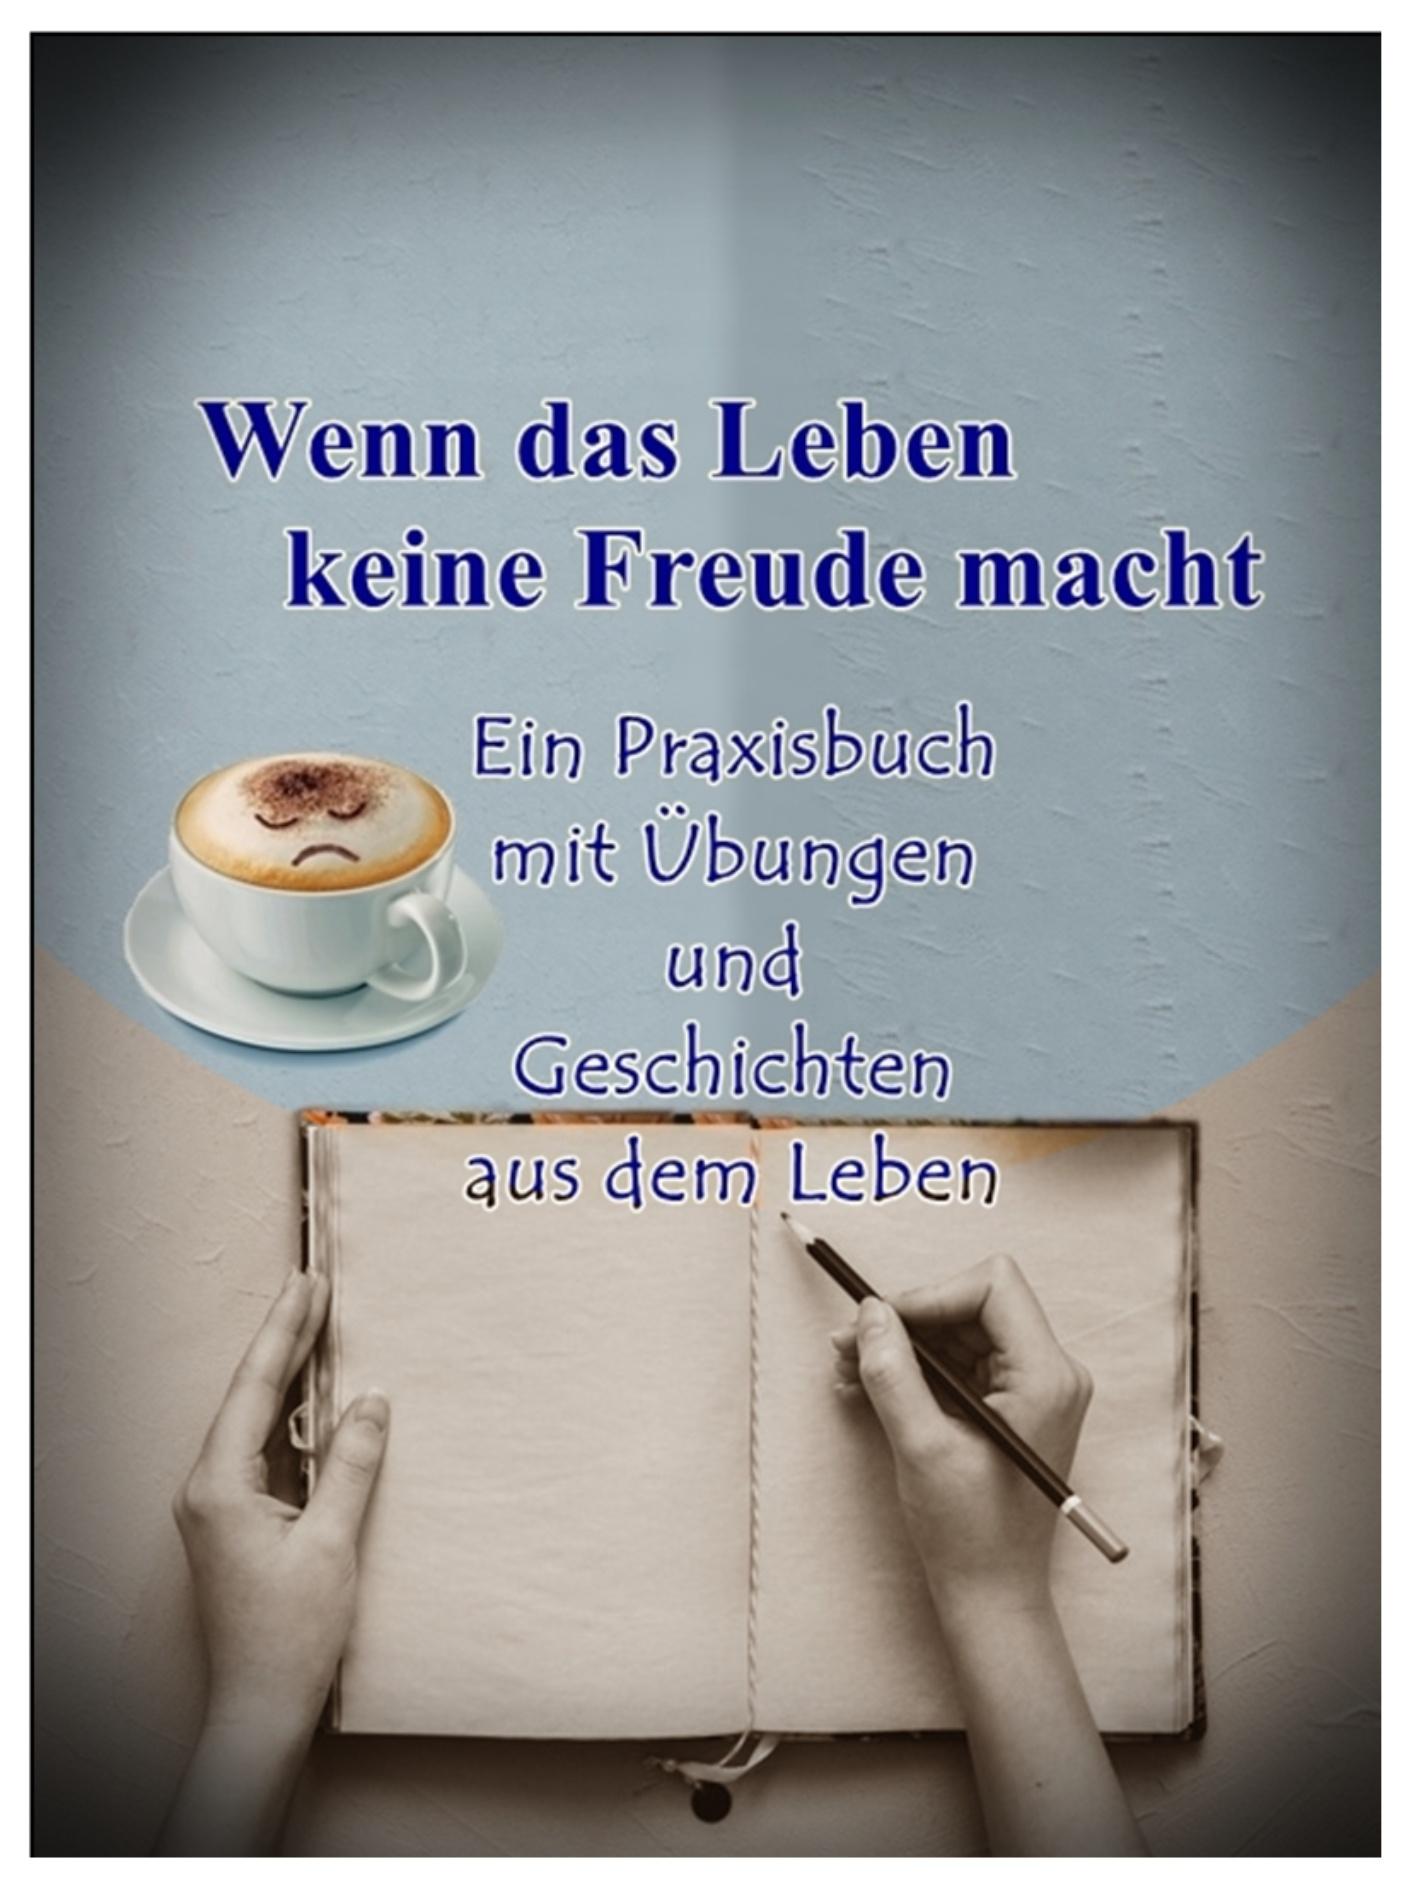 Screenshot 20190820 214934 01 - Über mich: Kerstin Anne Bosker